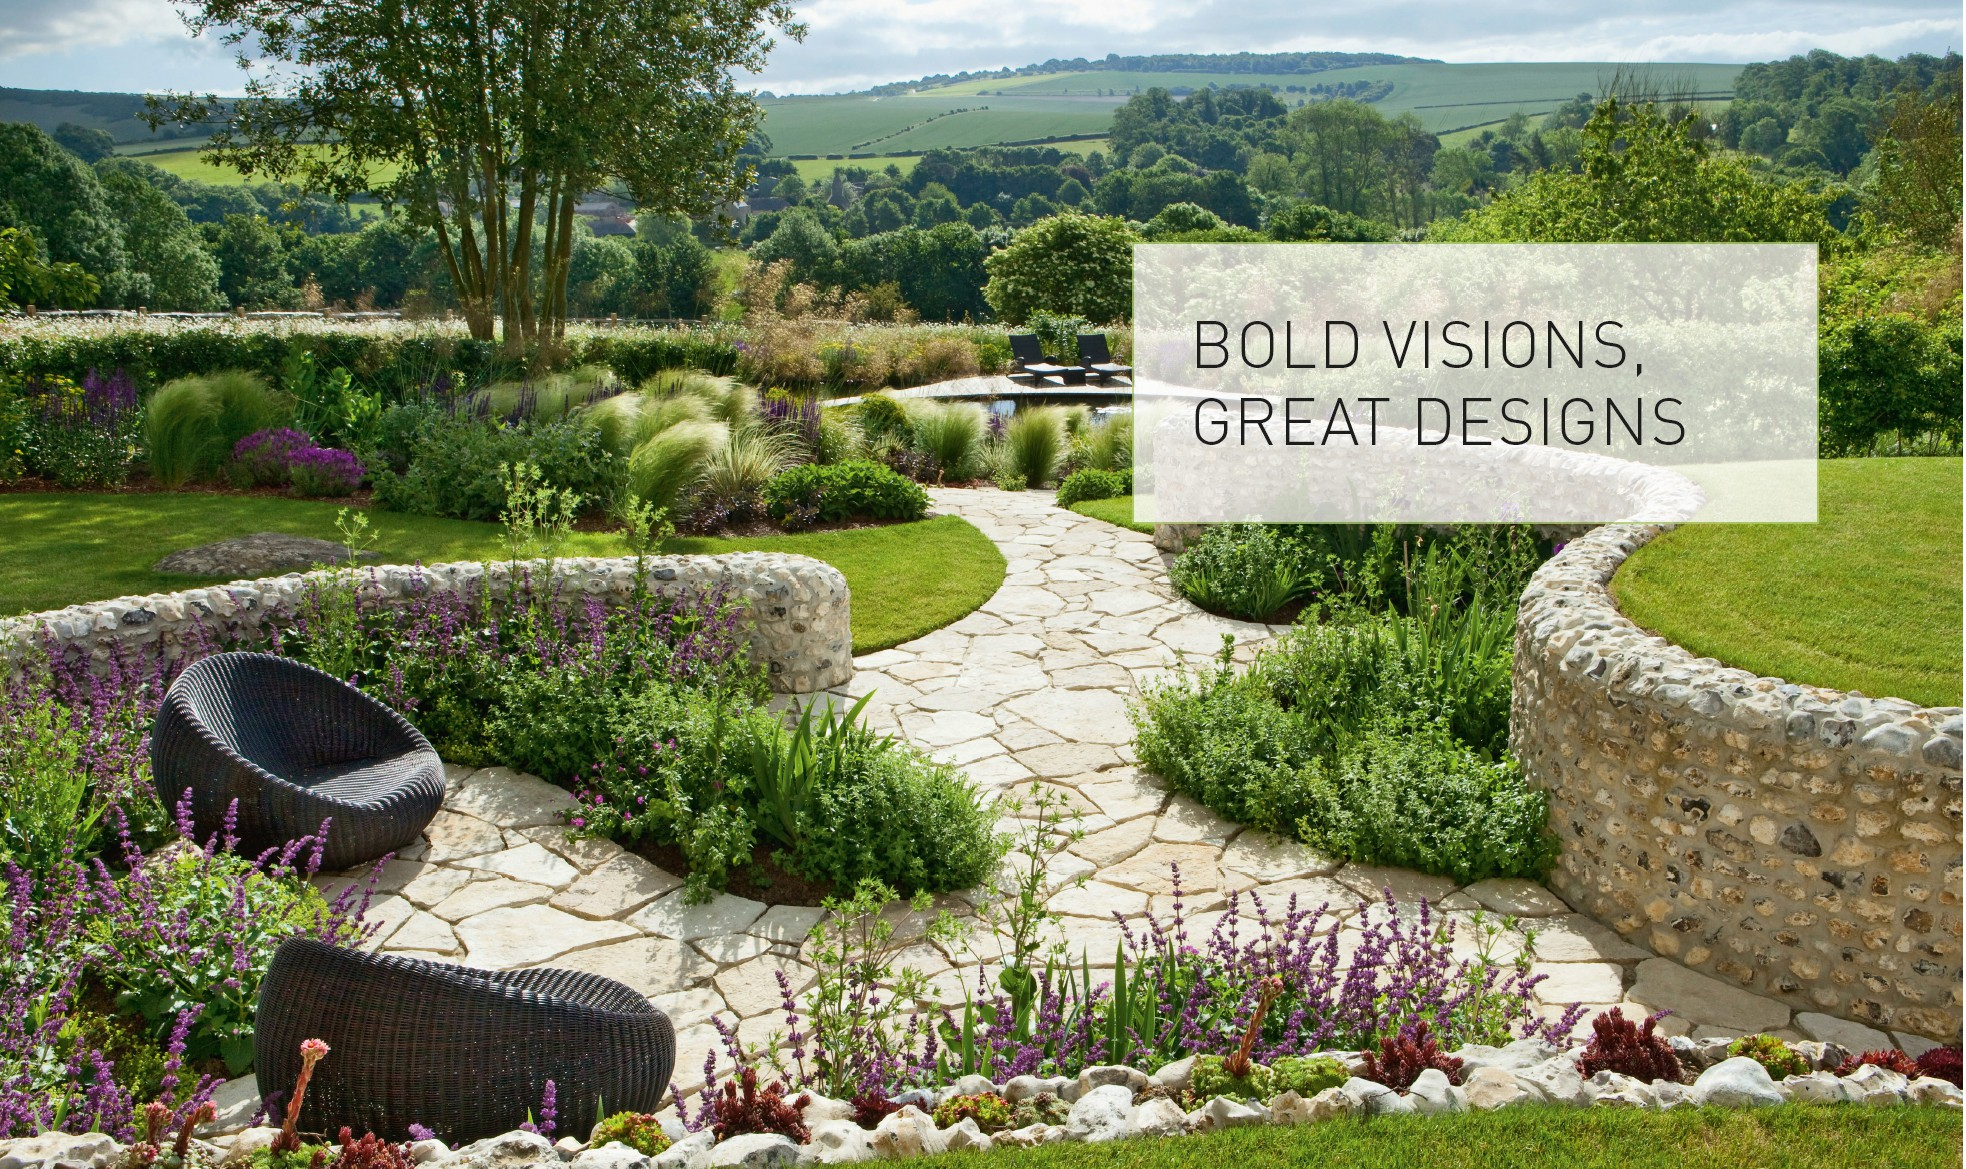 Urban chic - BOLD VISIONS, GREAT DESIGNS - Garden Design (2015) on